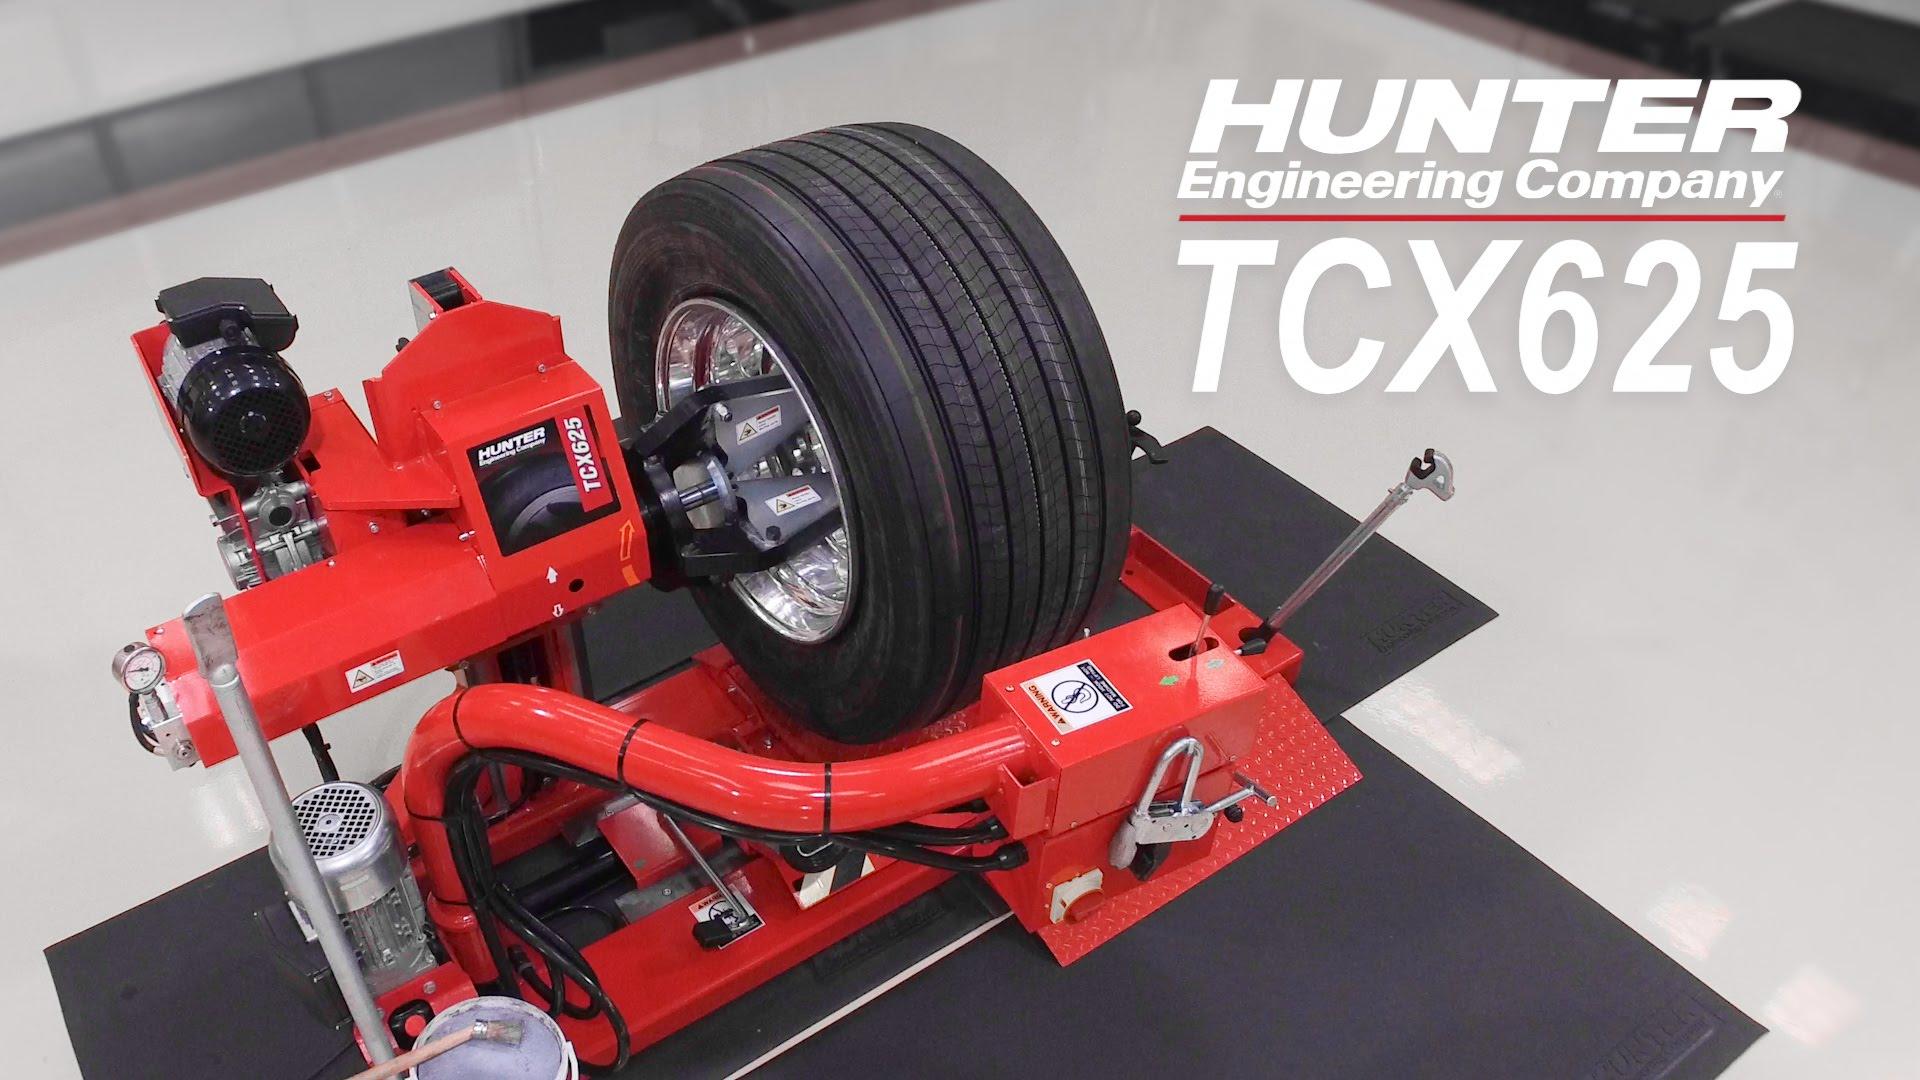 TCX625 Heavy Duty Tire Changer from Hunter Engineering